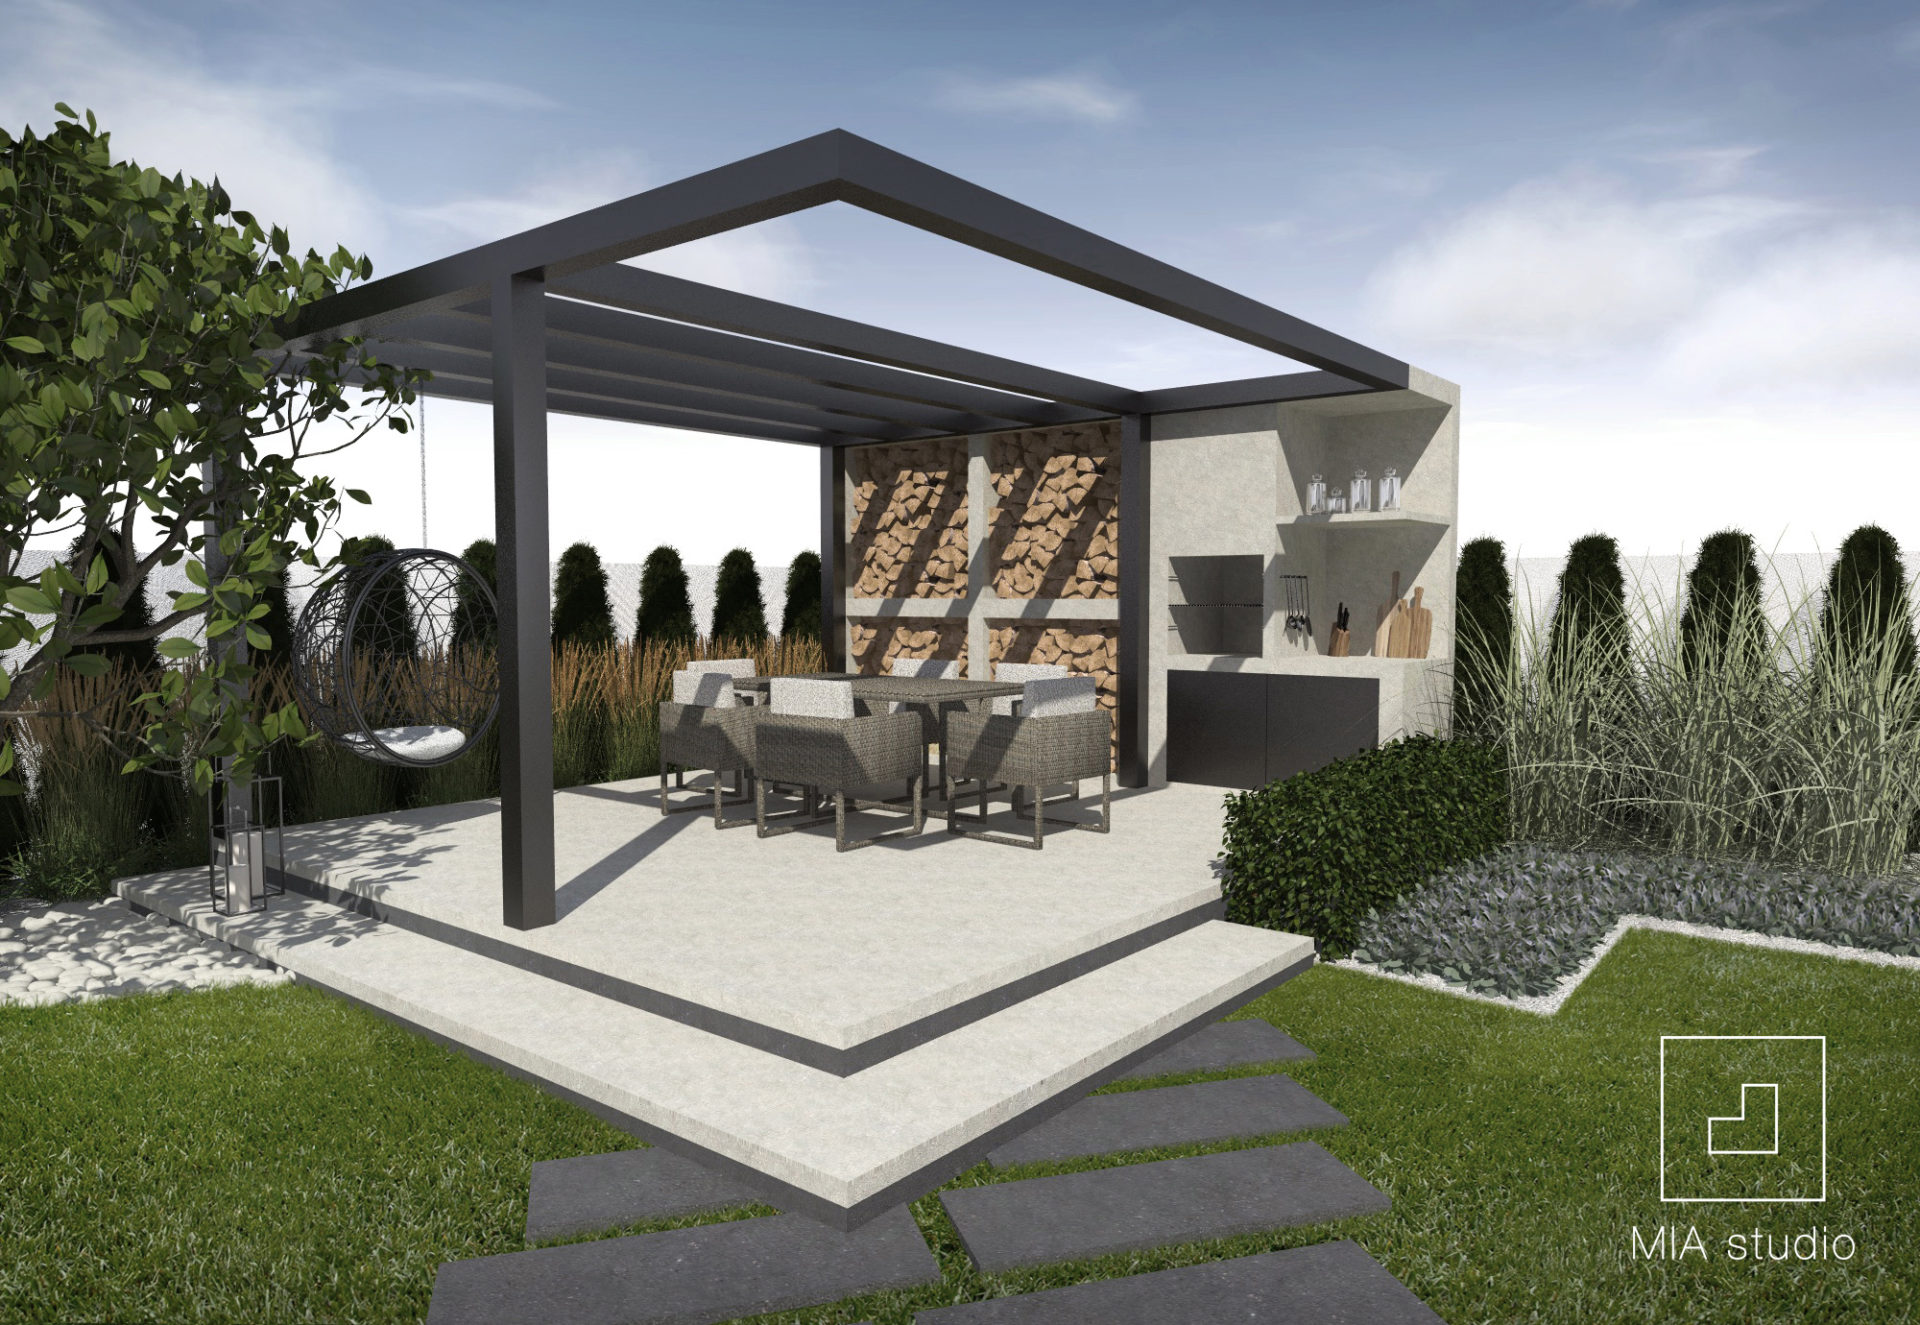 nowoczesna altana z grillem